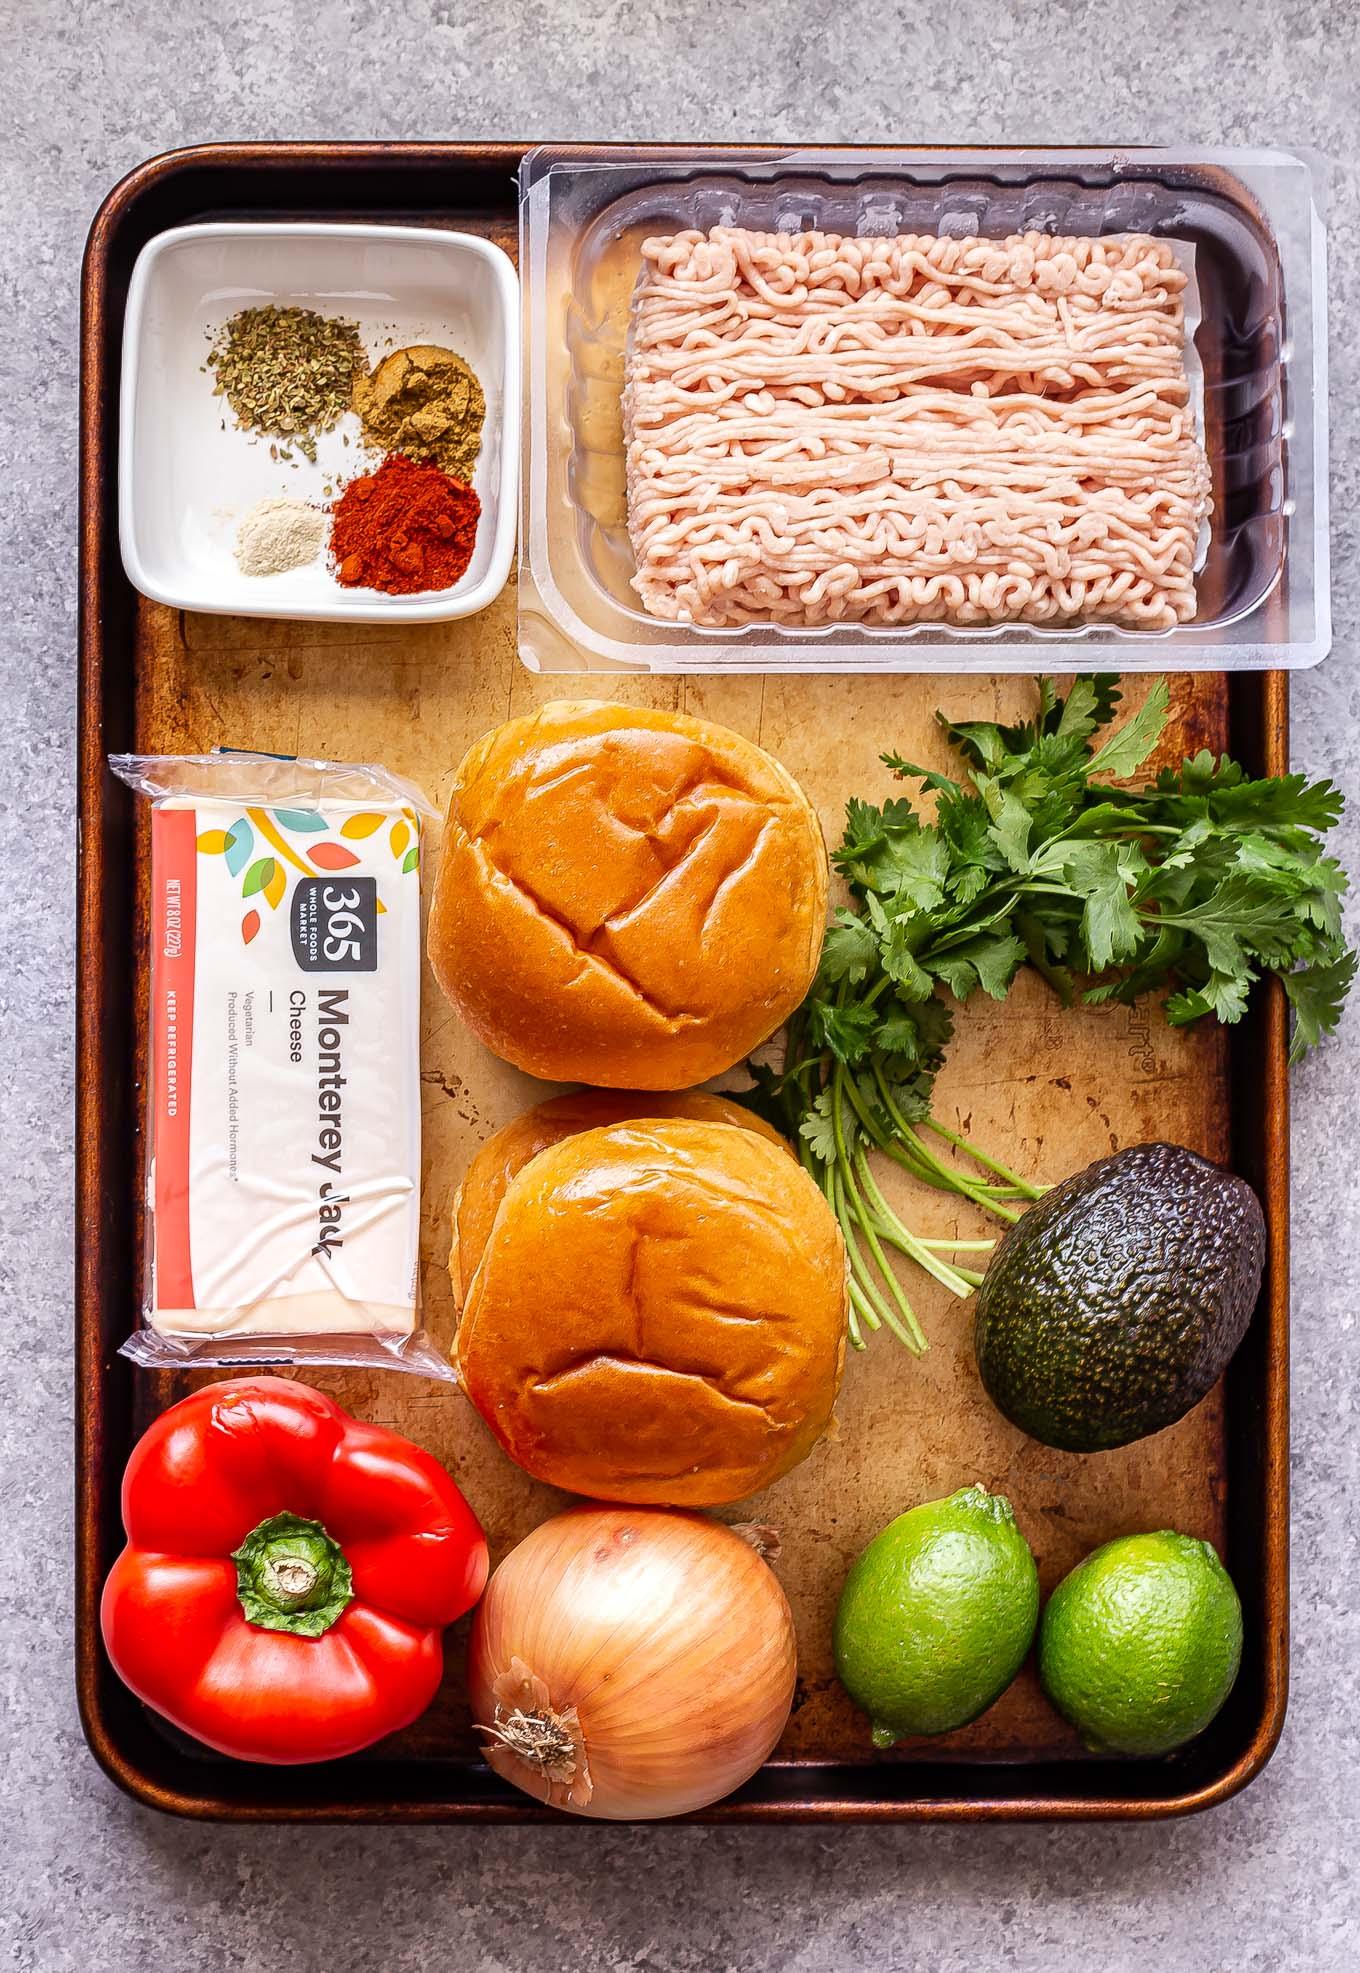 ingredients for Chicken Fajita Burgers on a sheet pan